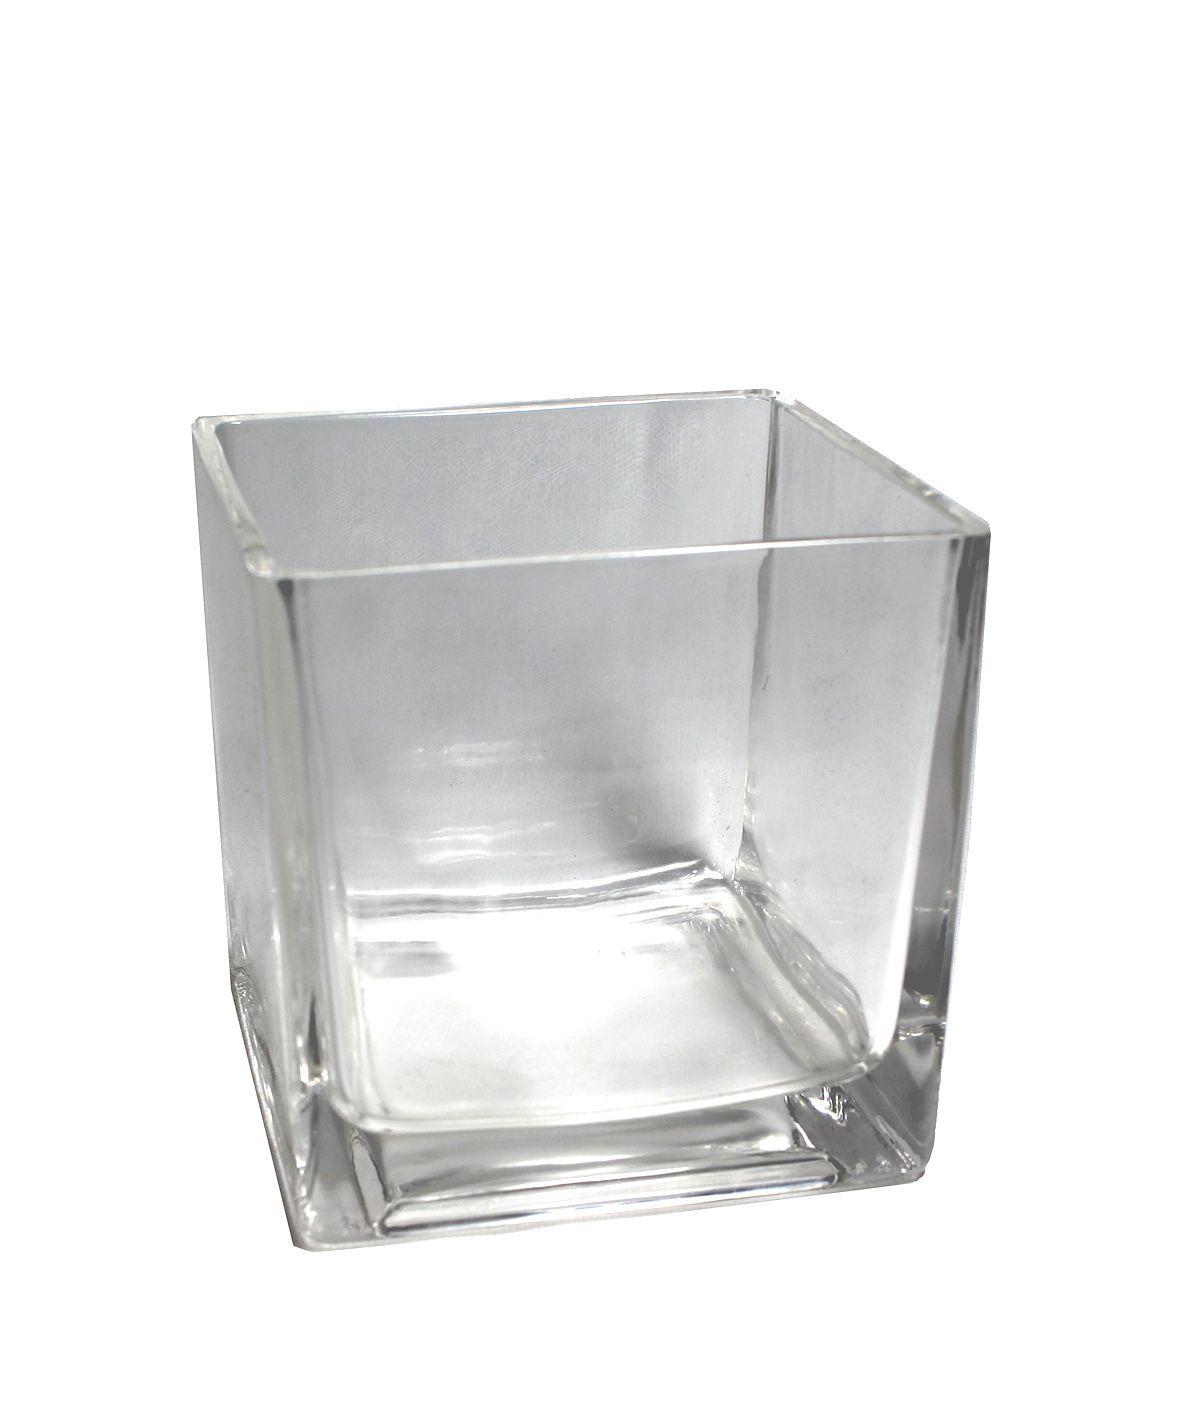 Vaso De Vidro Quadrado Médio - 12Cm  Altura X  13 Cm Boca